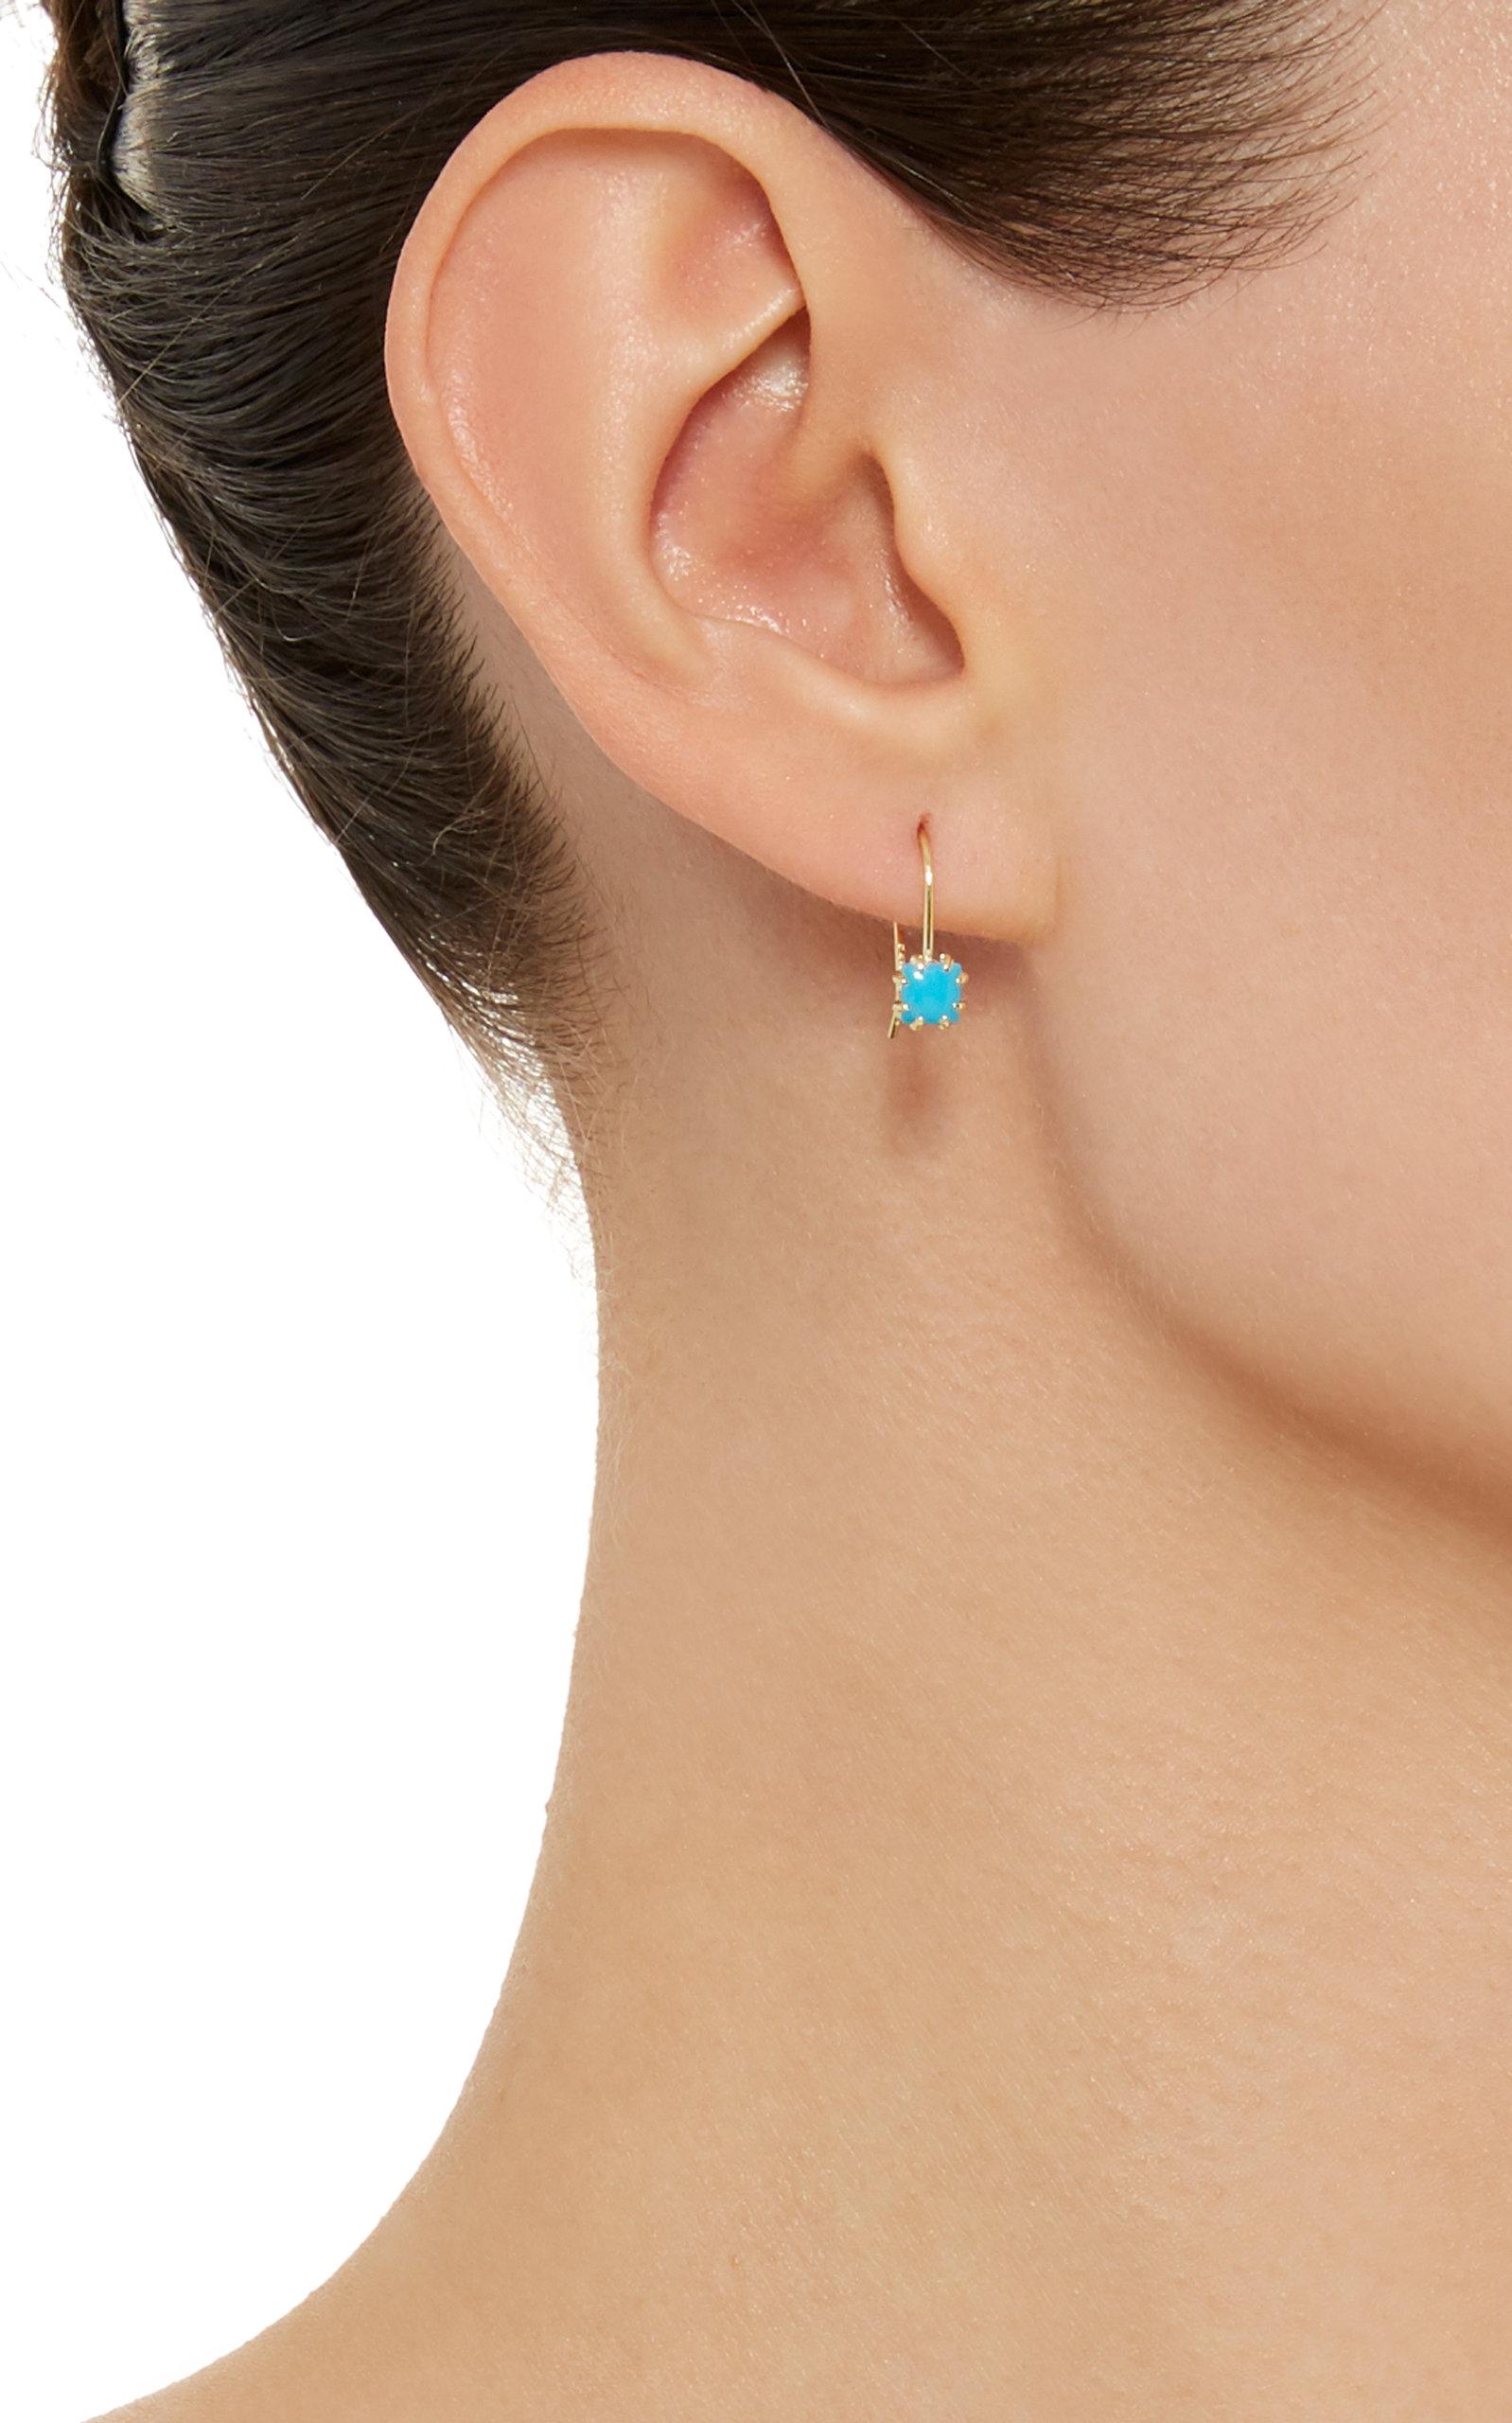 Zephyr 14K Gold Turquoise Earrings Ila HOA1yS8r